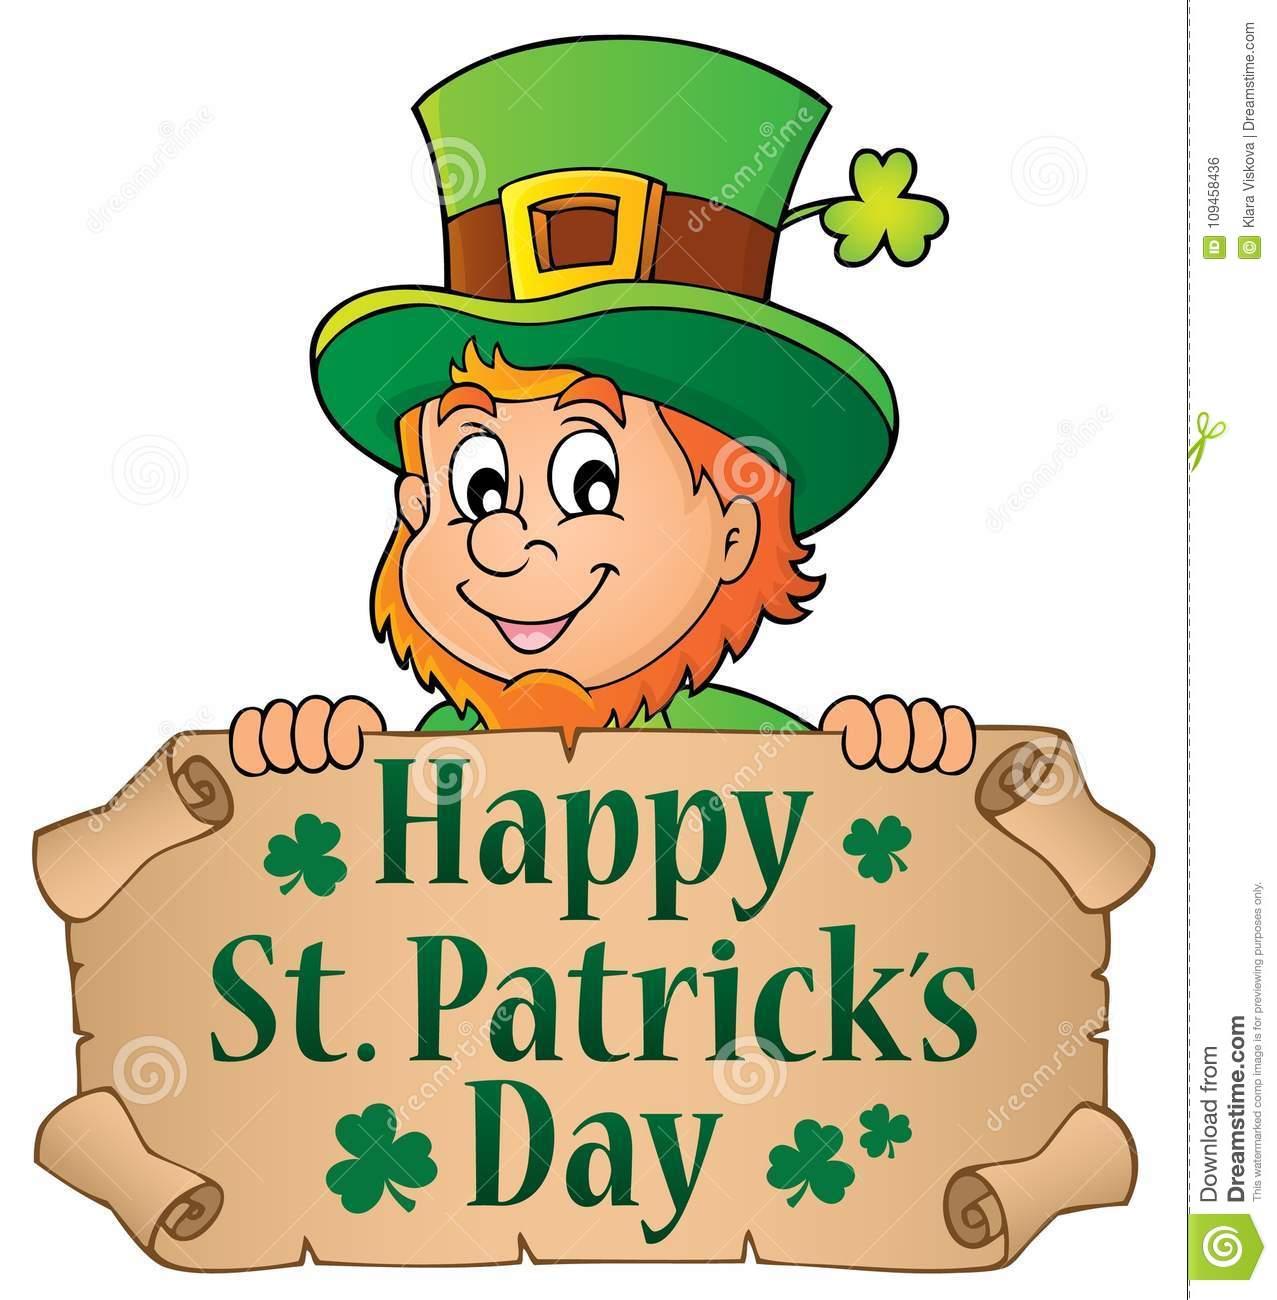 Happy St Patricks Day Theme 4 Stock Vector.